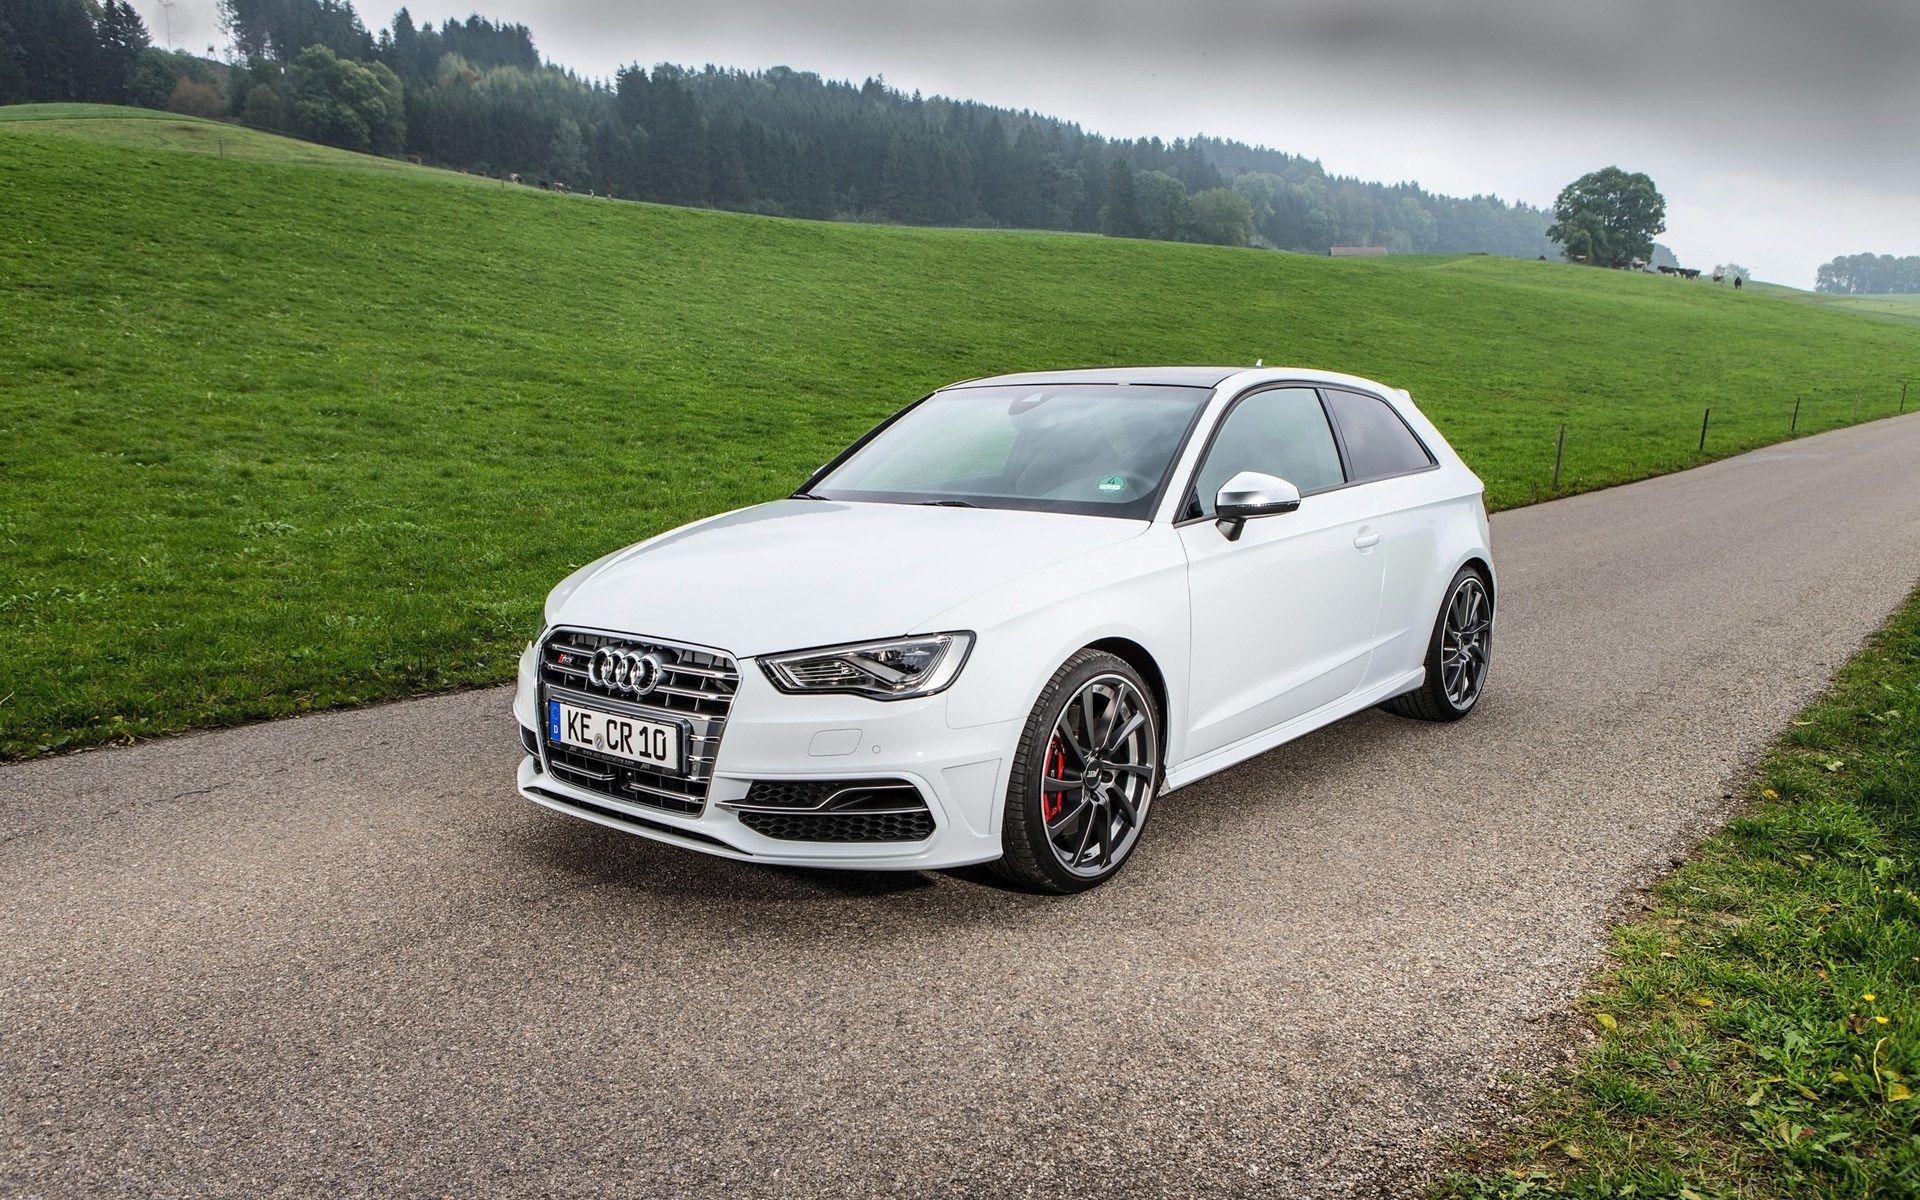 X Px Free Wallpaper And Screensavers For Audi S By Well - Audi car ke wallpaper